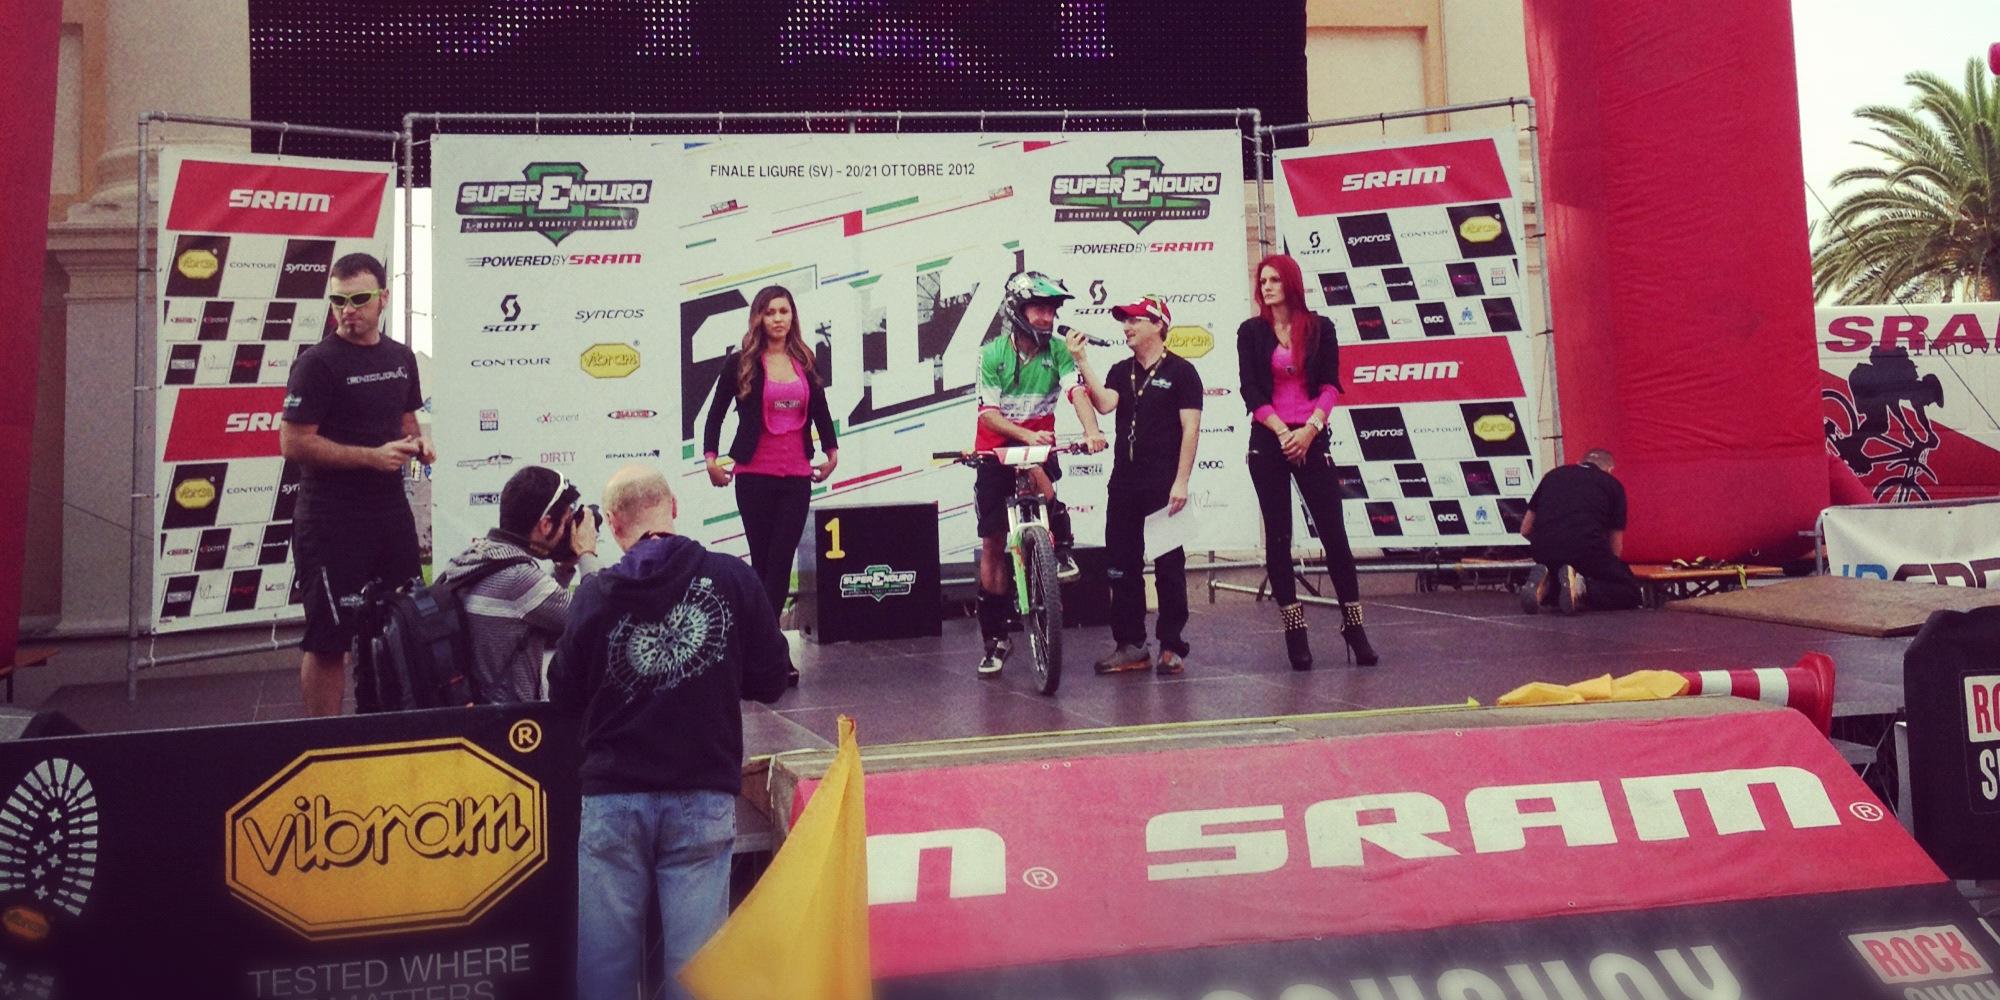 superenduro_2012_finale_davide_sottocornola_start